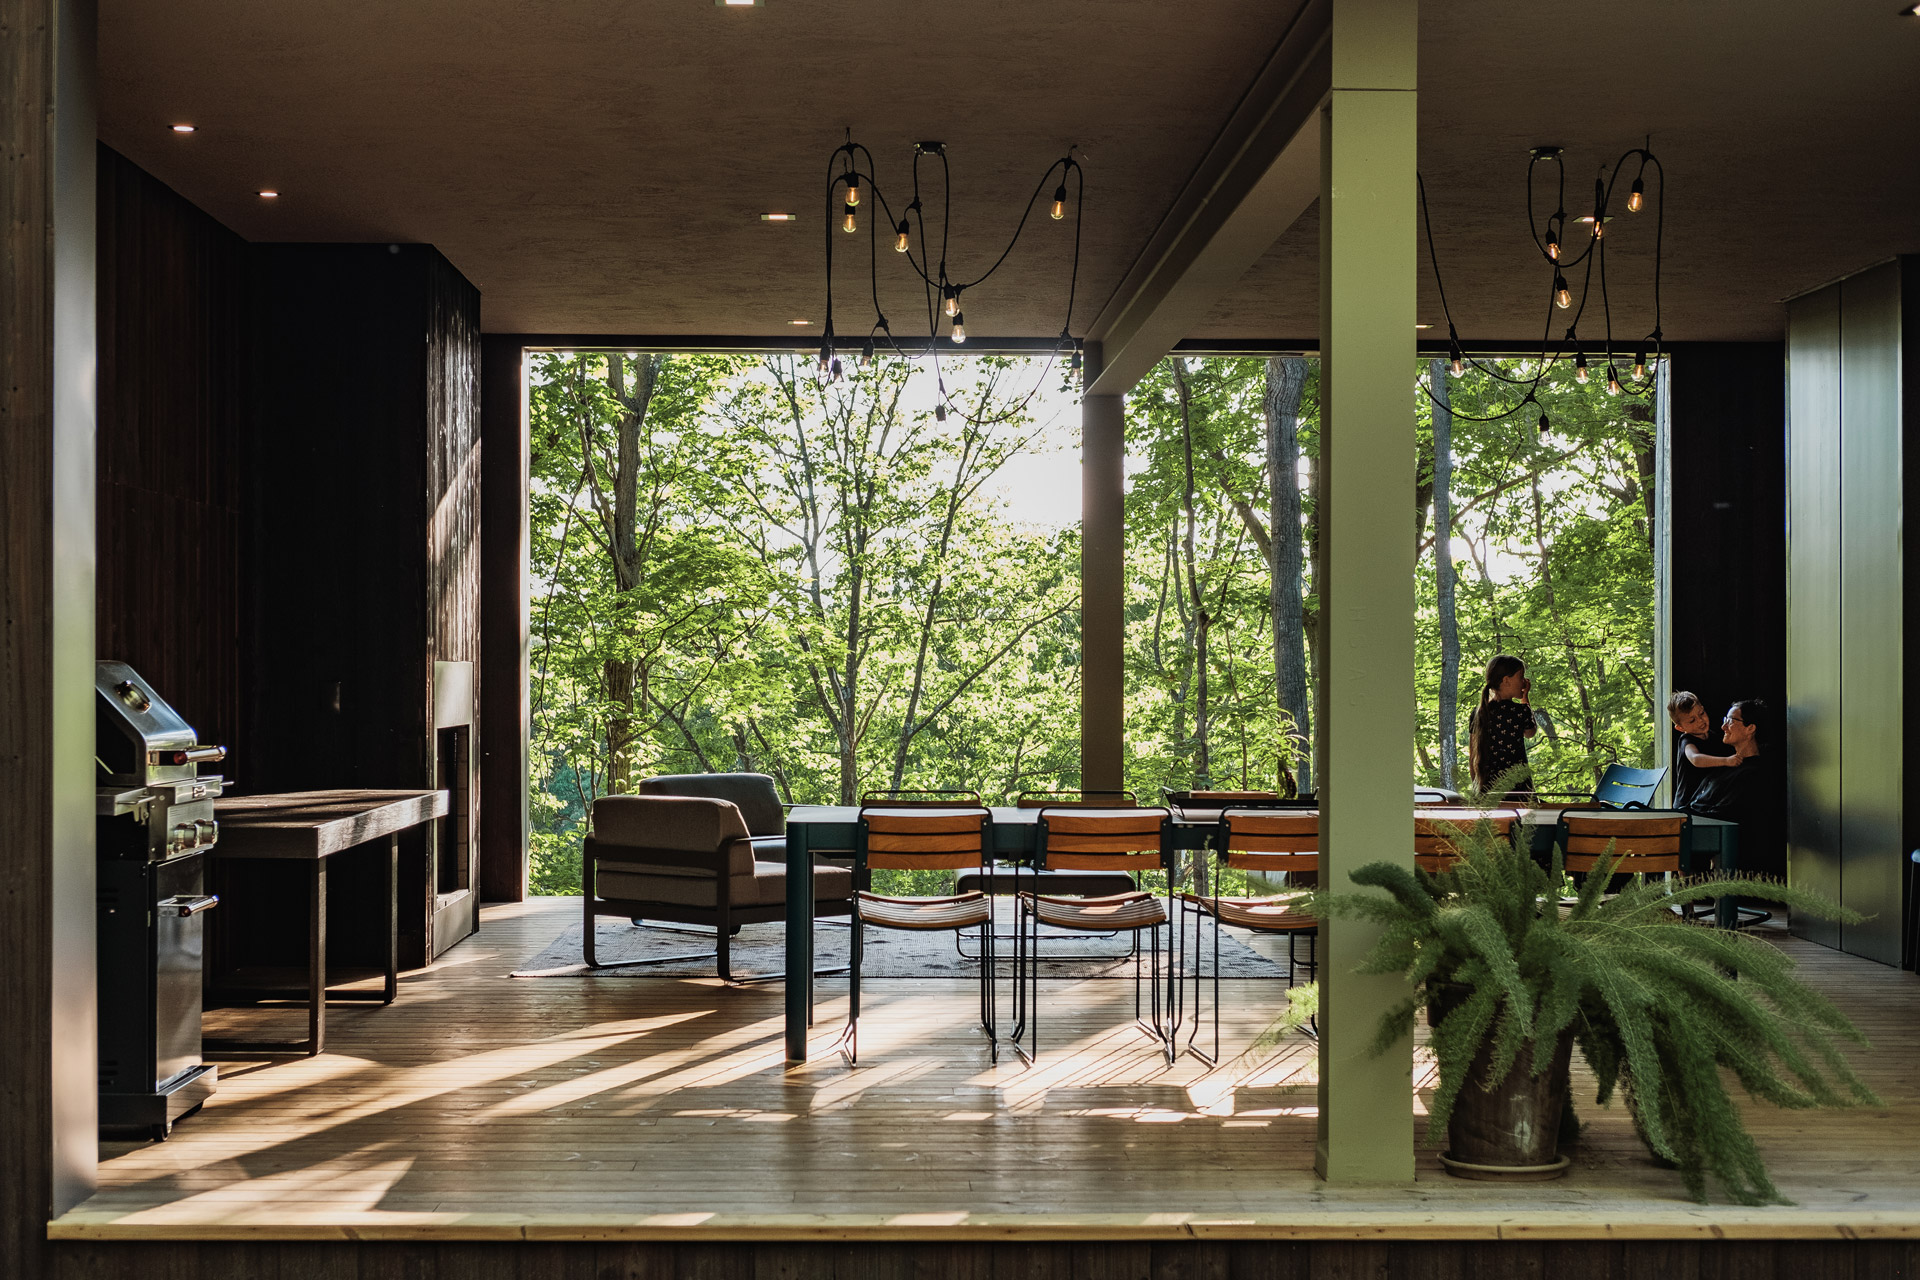 Birch Le Collaboration House